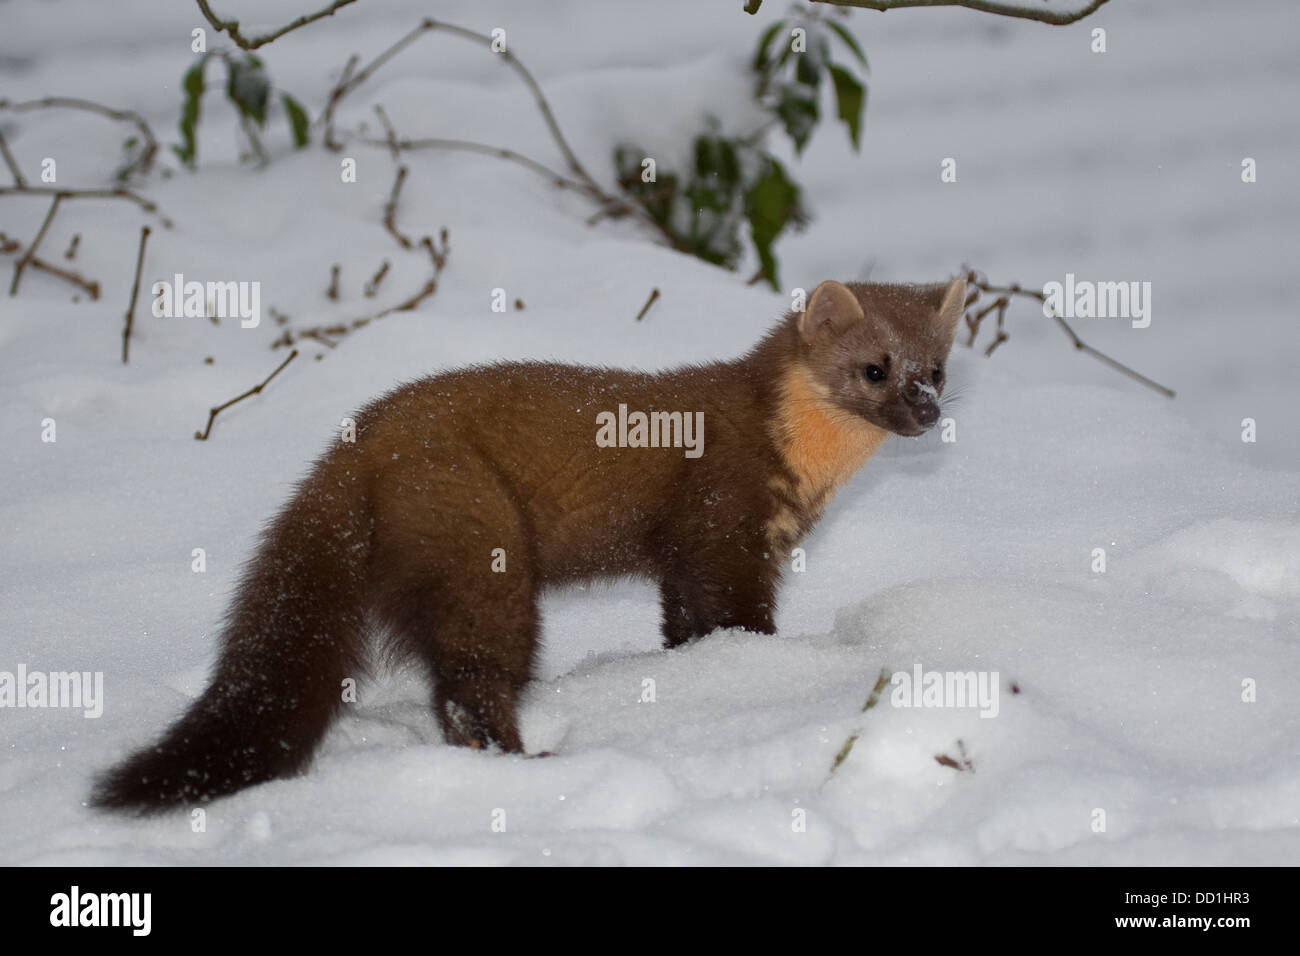 la martre d'europe, hiver, neige, baummarder, baum-marder